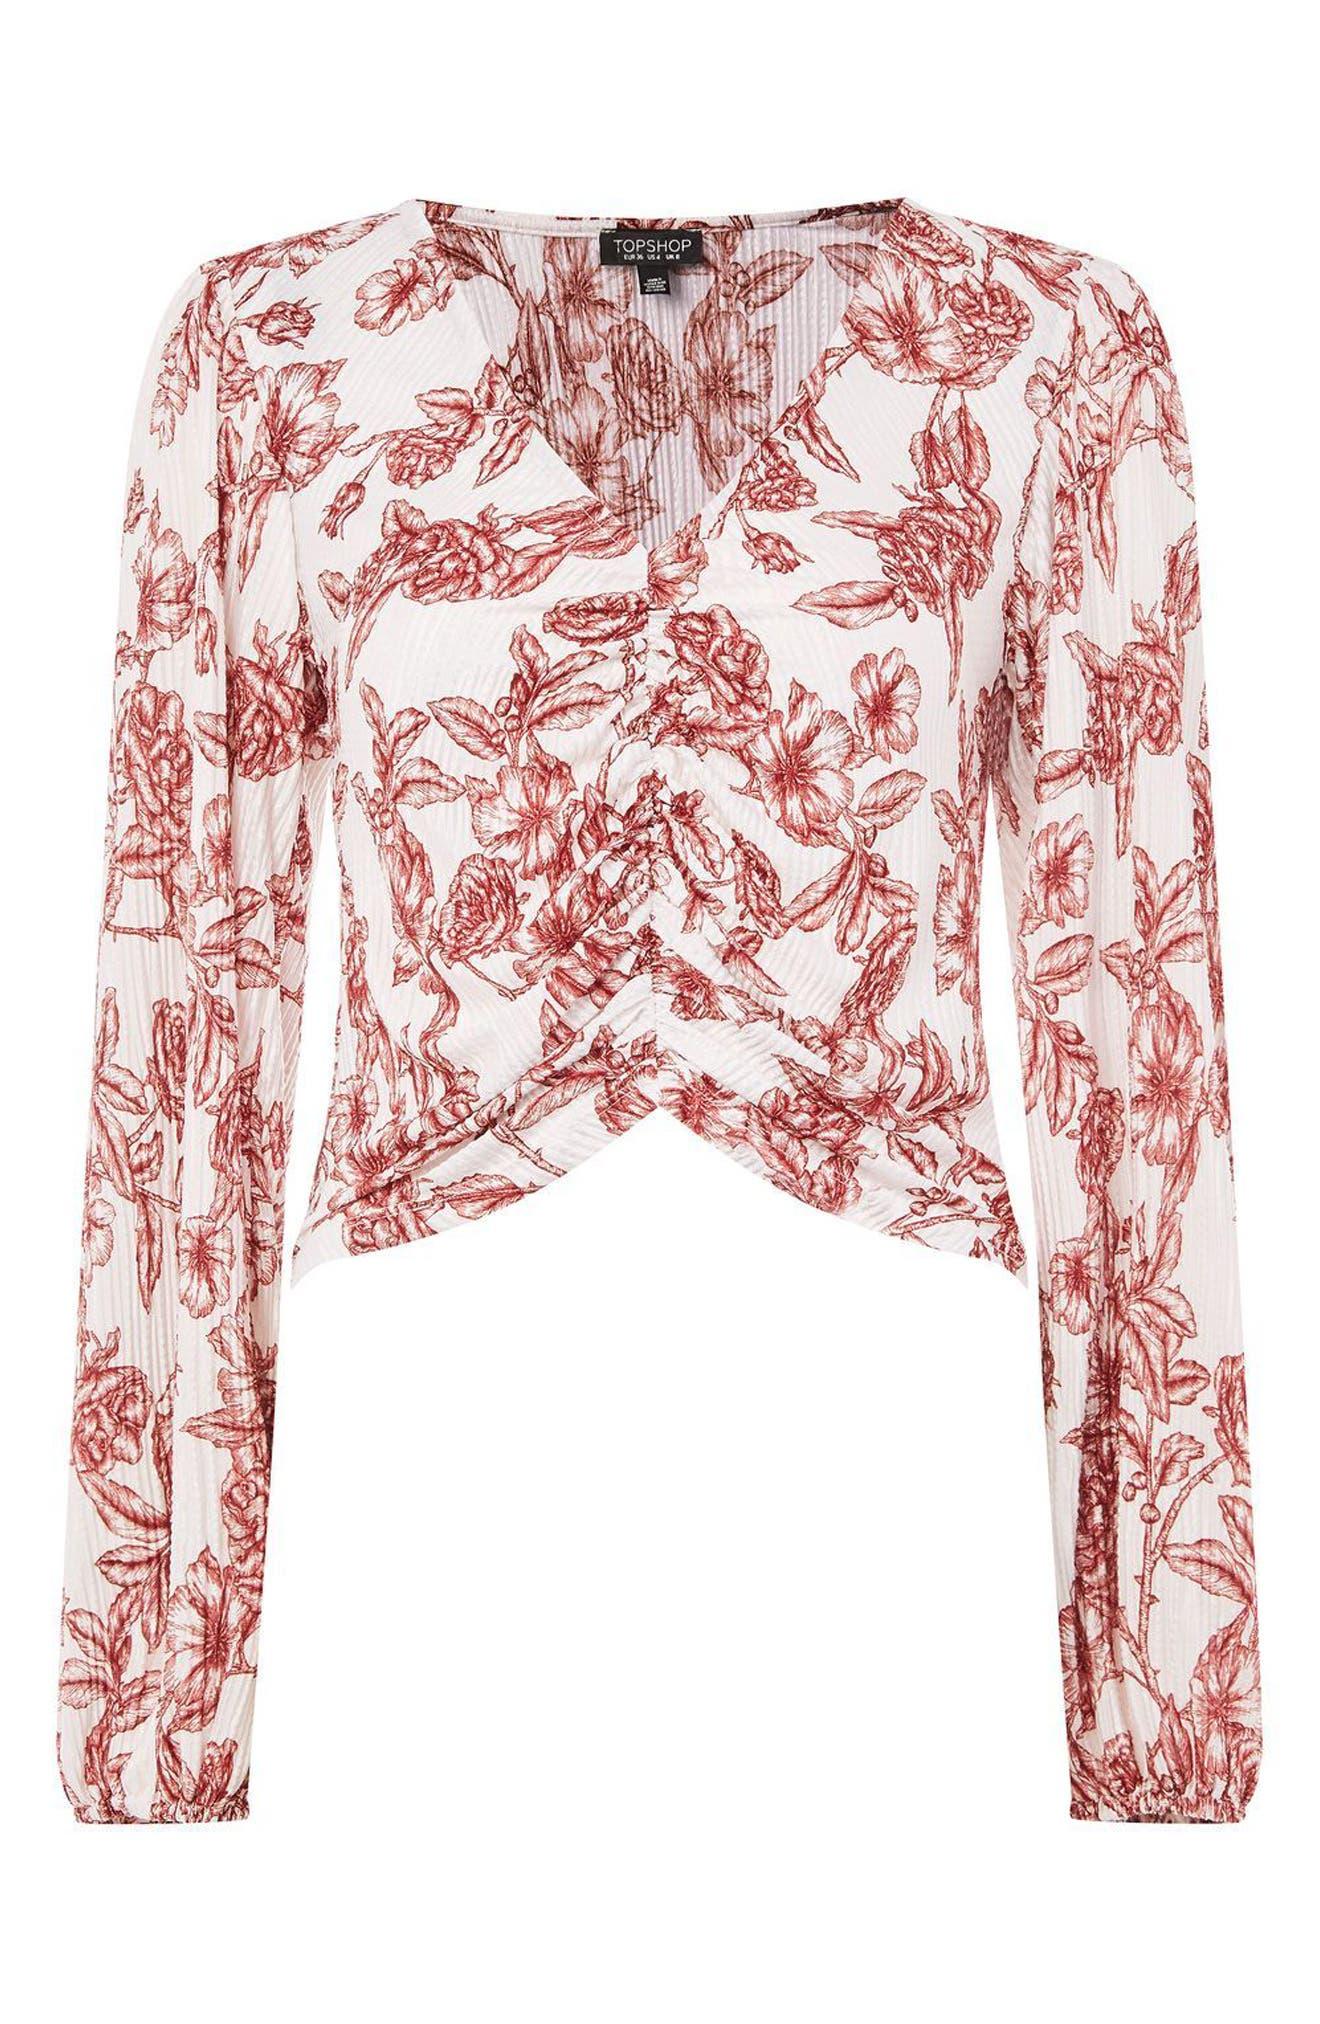 Sketchy Floral Blouse,                             Alternate thumbnail 5, color,                             Cream Multi